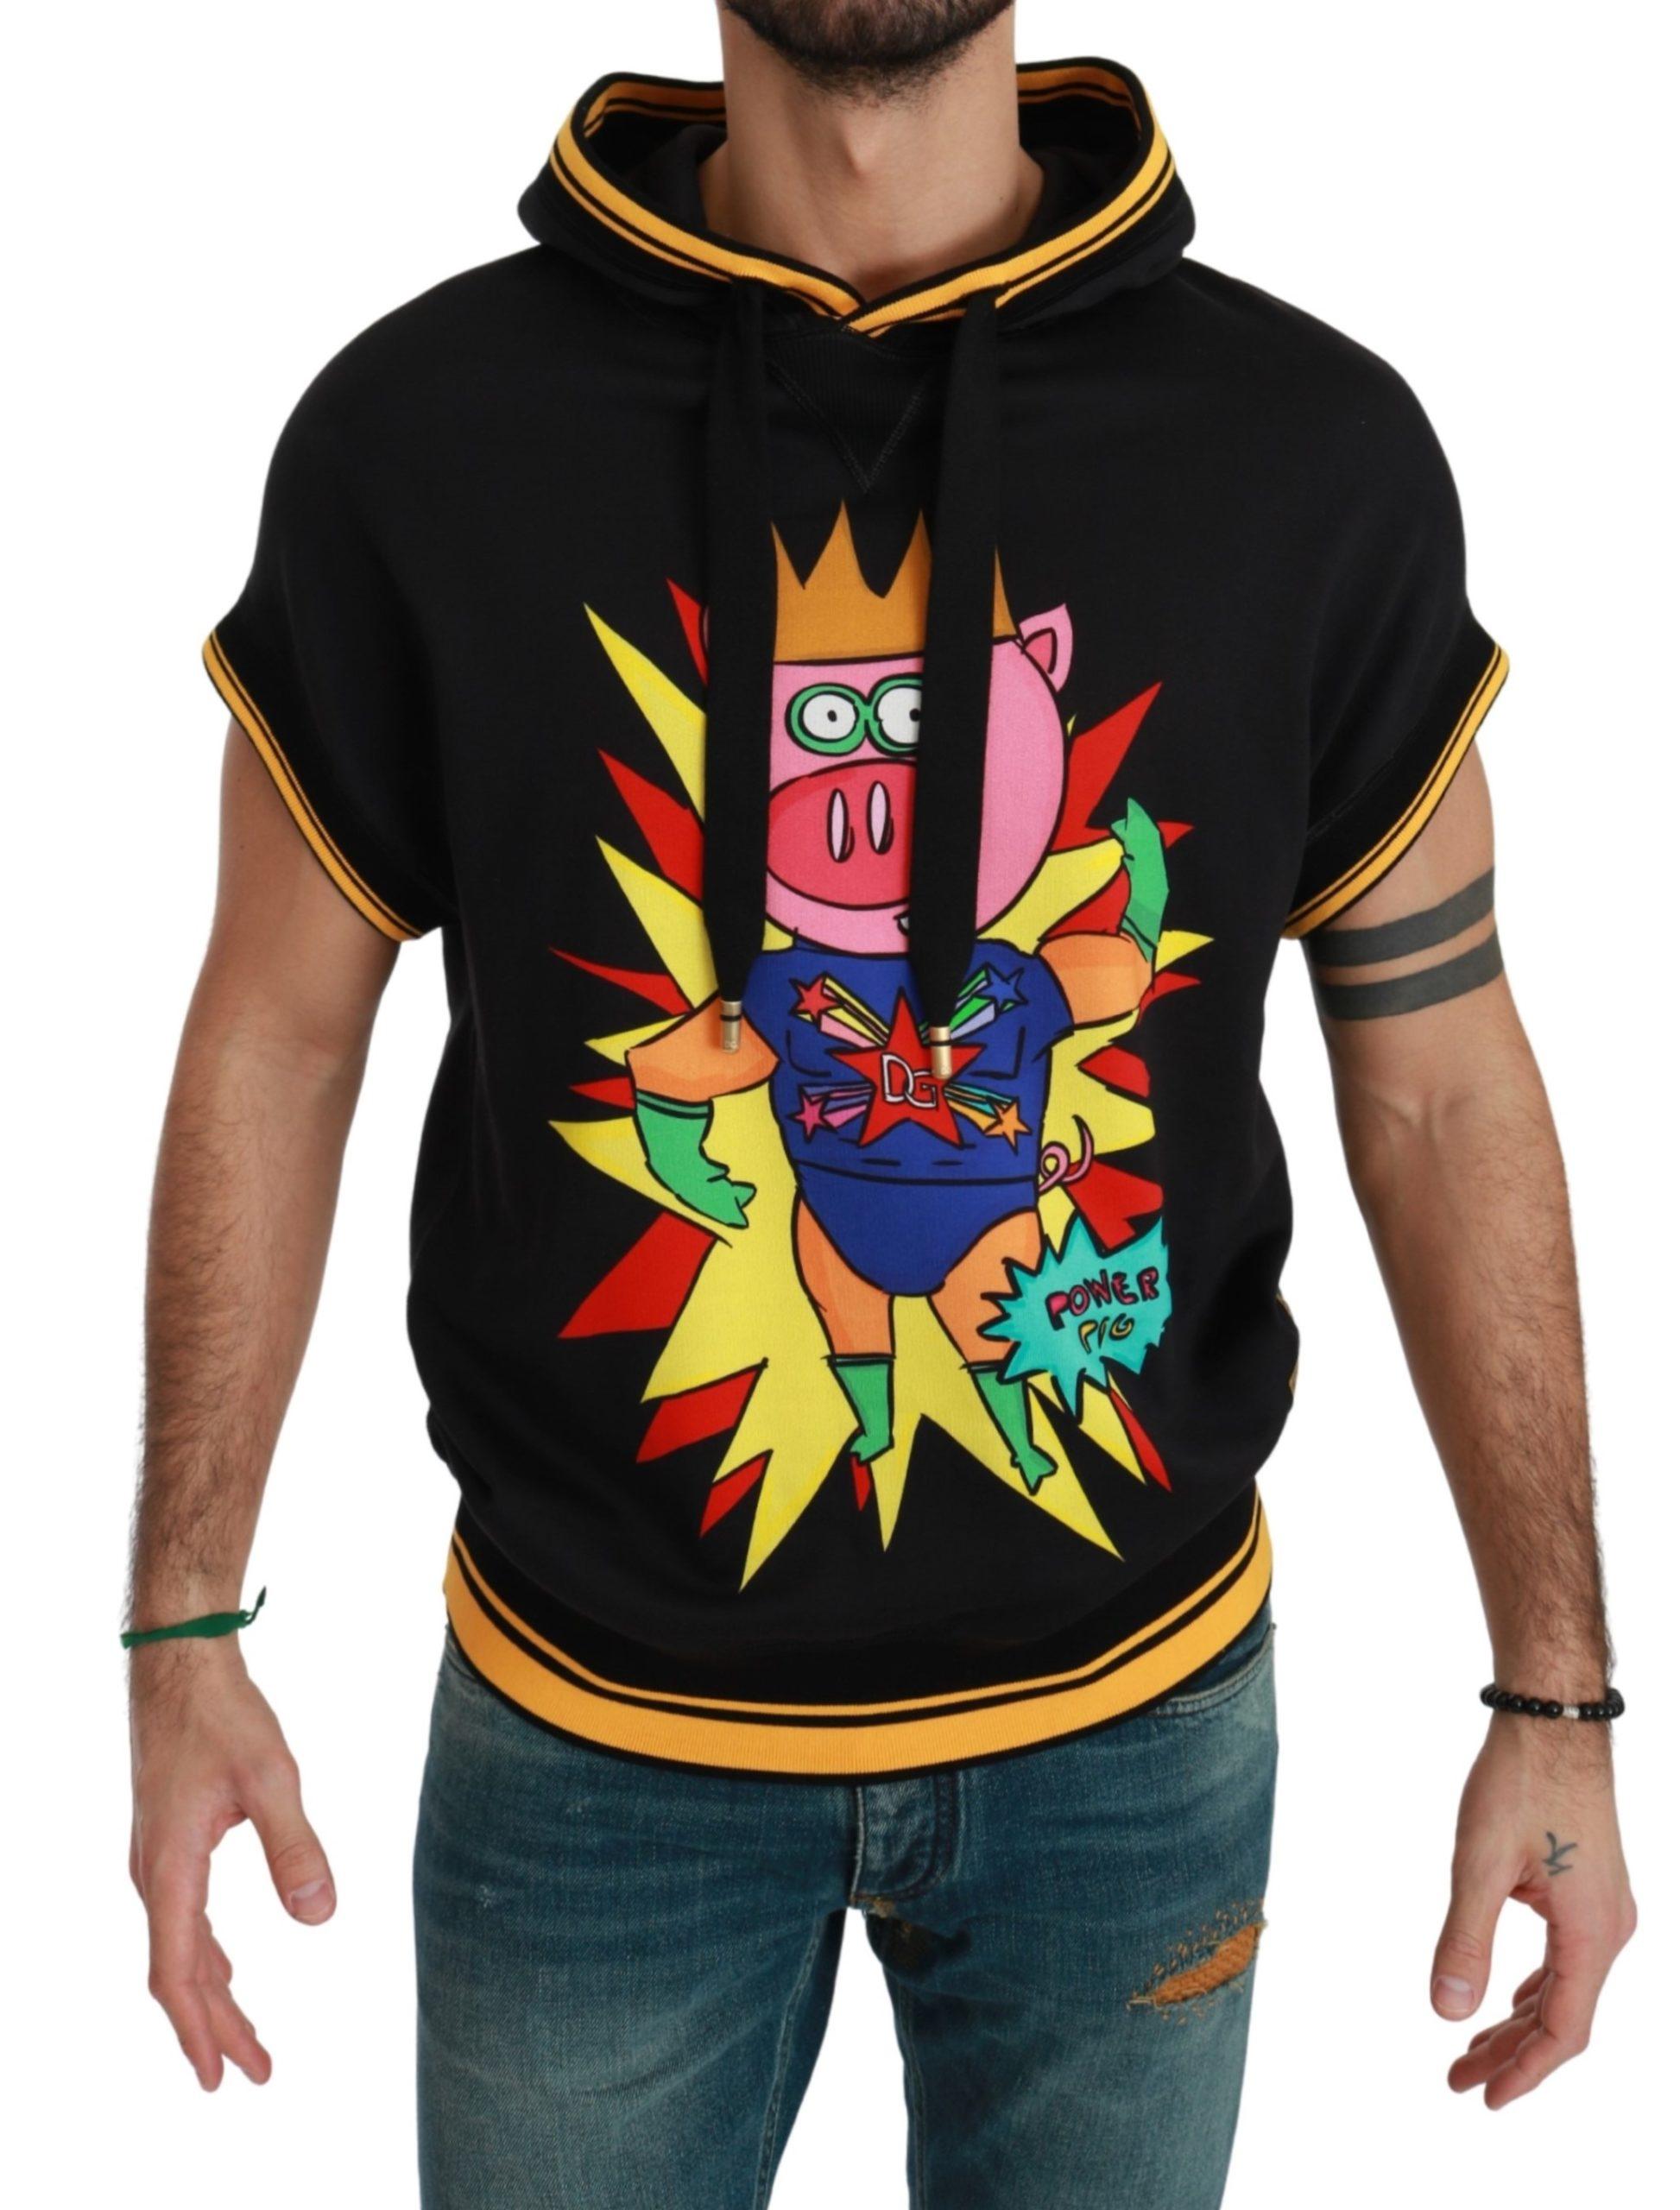 Dolce & Gabbana Men's Hooded Pig of the Year Cotton Sweatshirt Black TSH4634 - IT44 | S